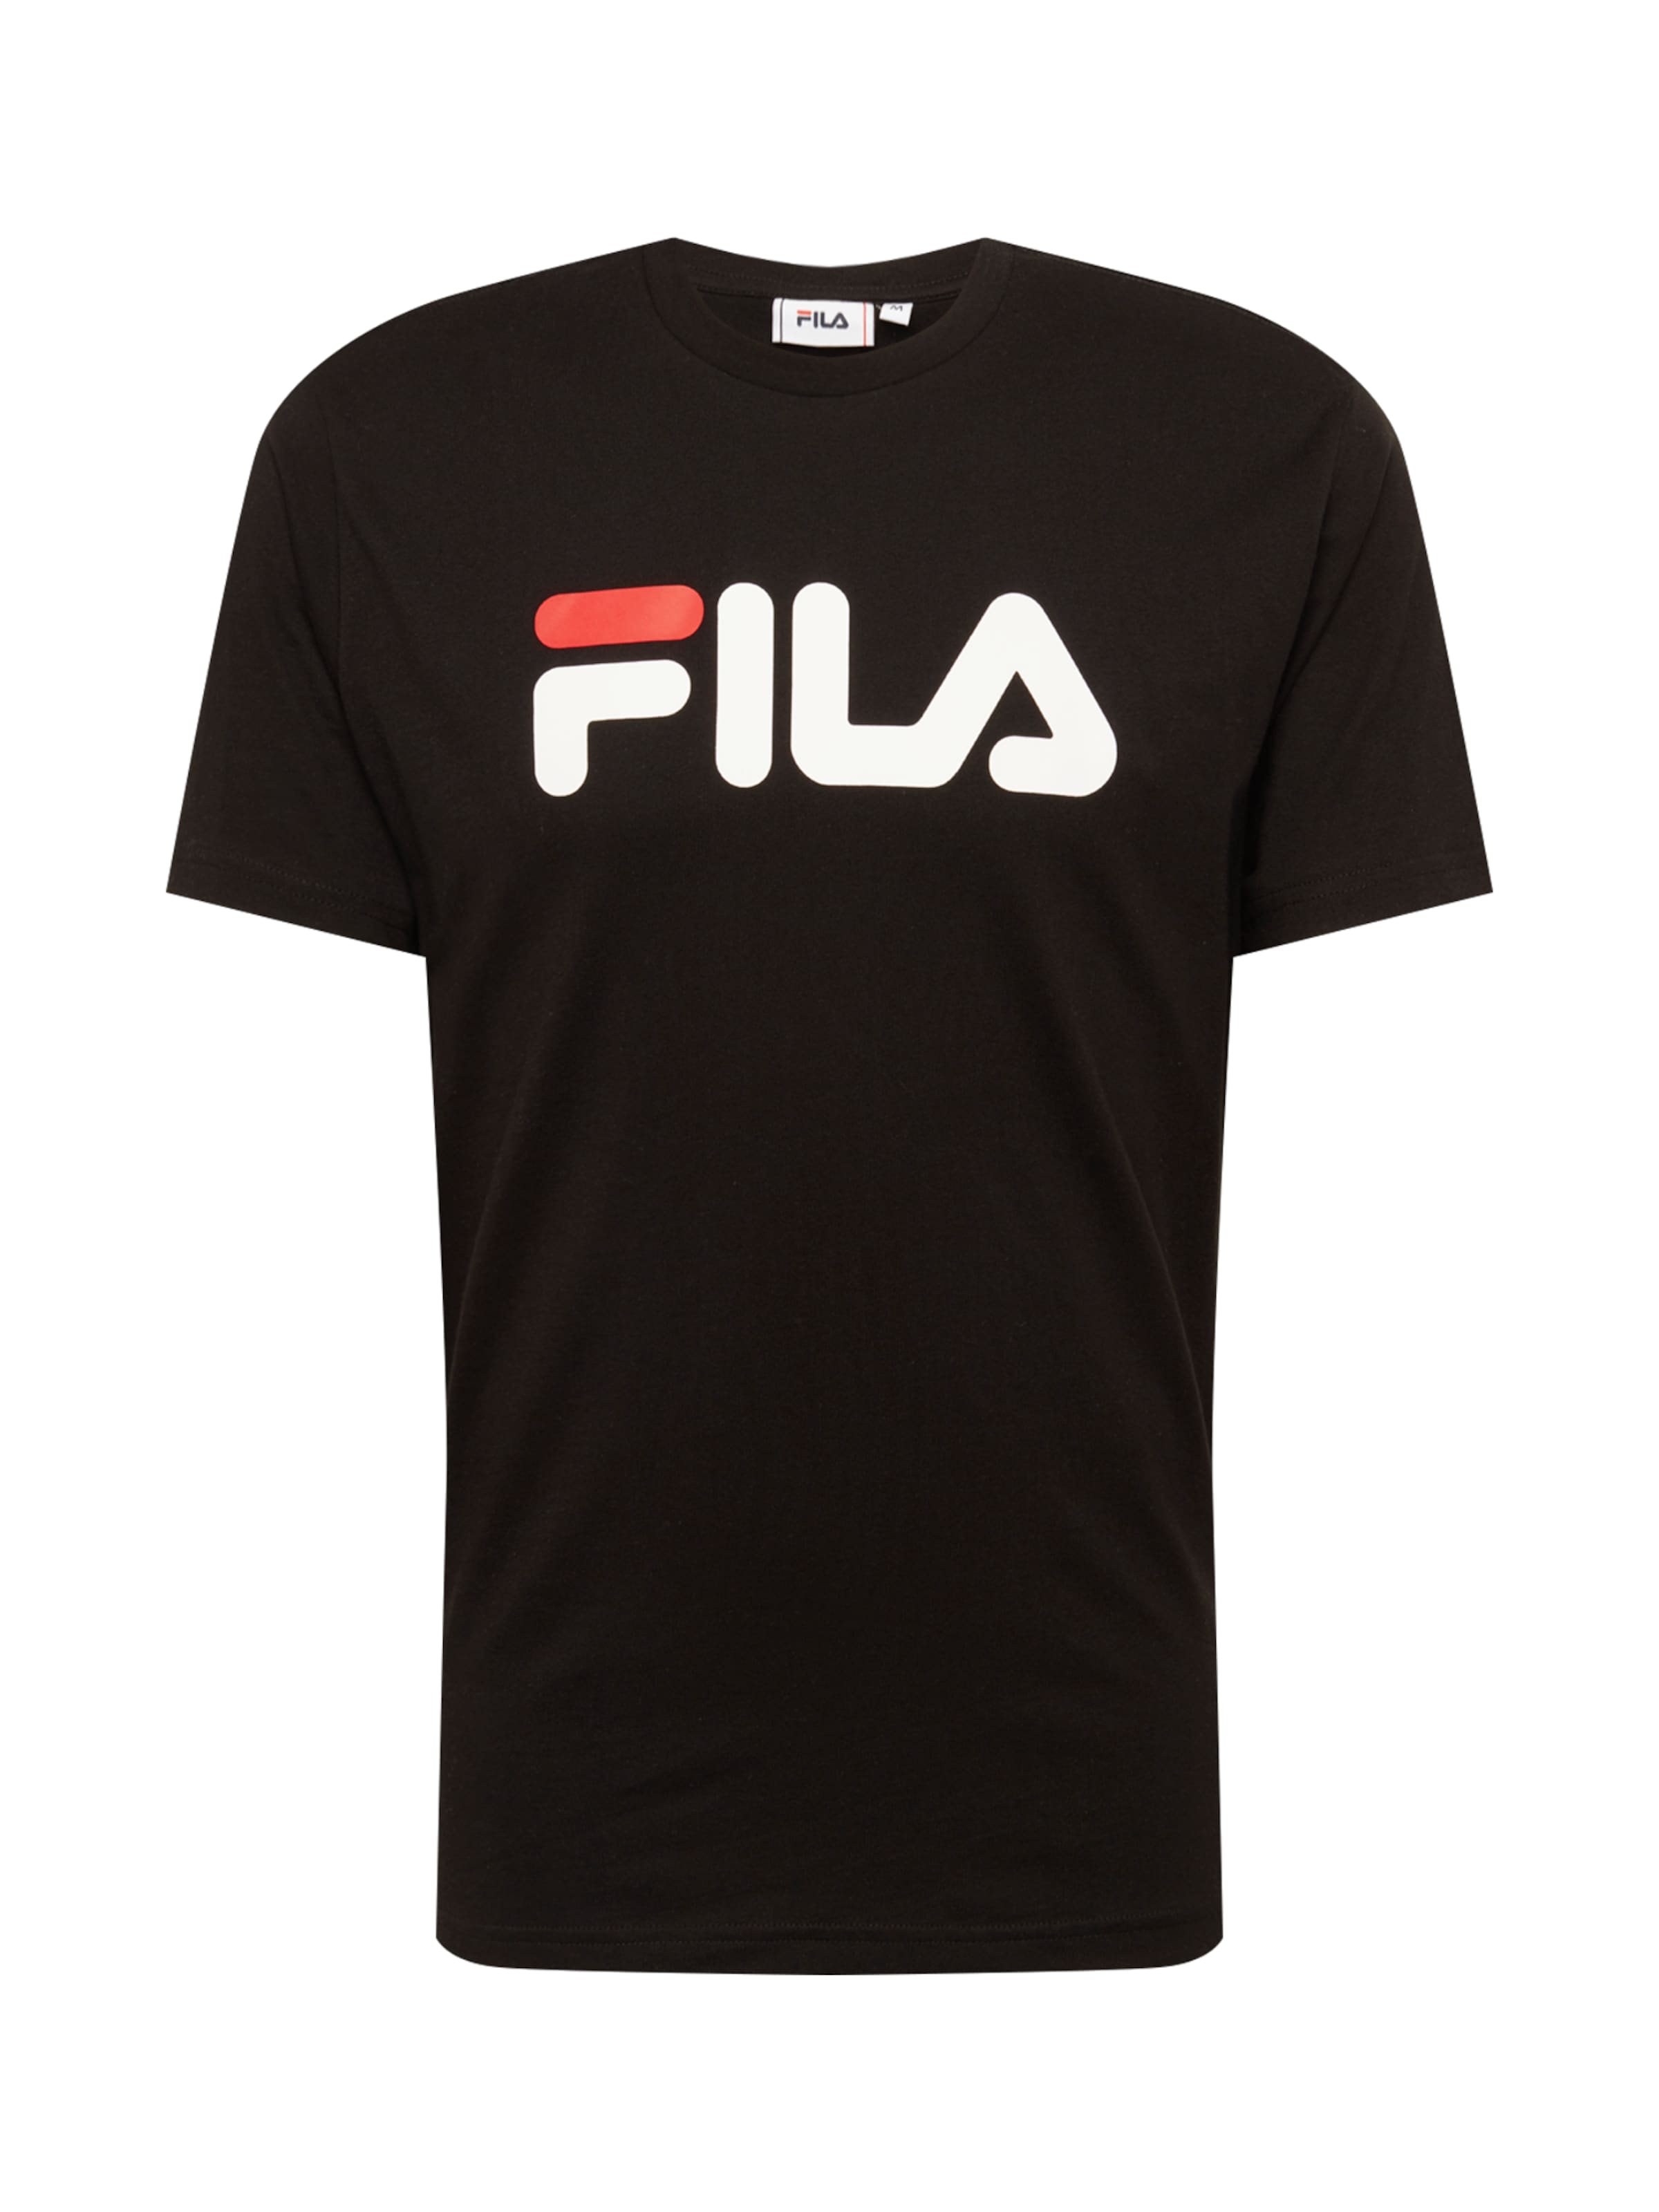 shirt En Fila T 'pure' NoirBlanc tdhsQrC